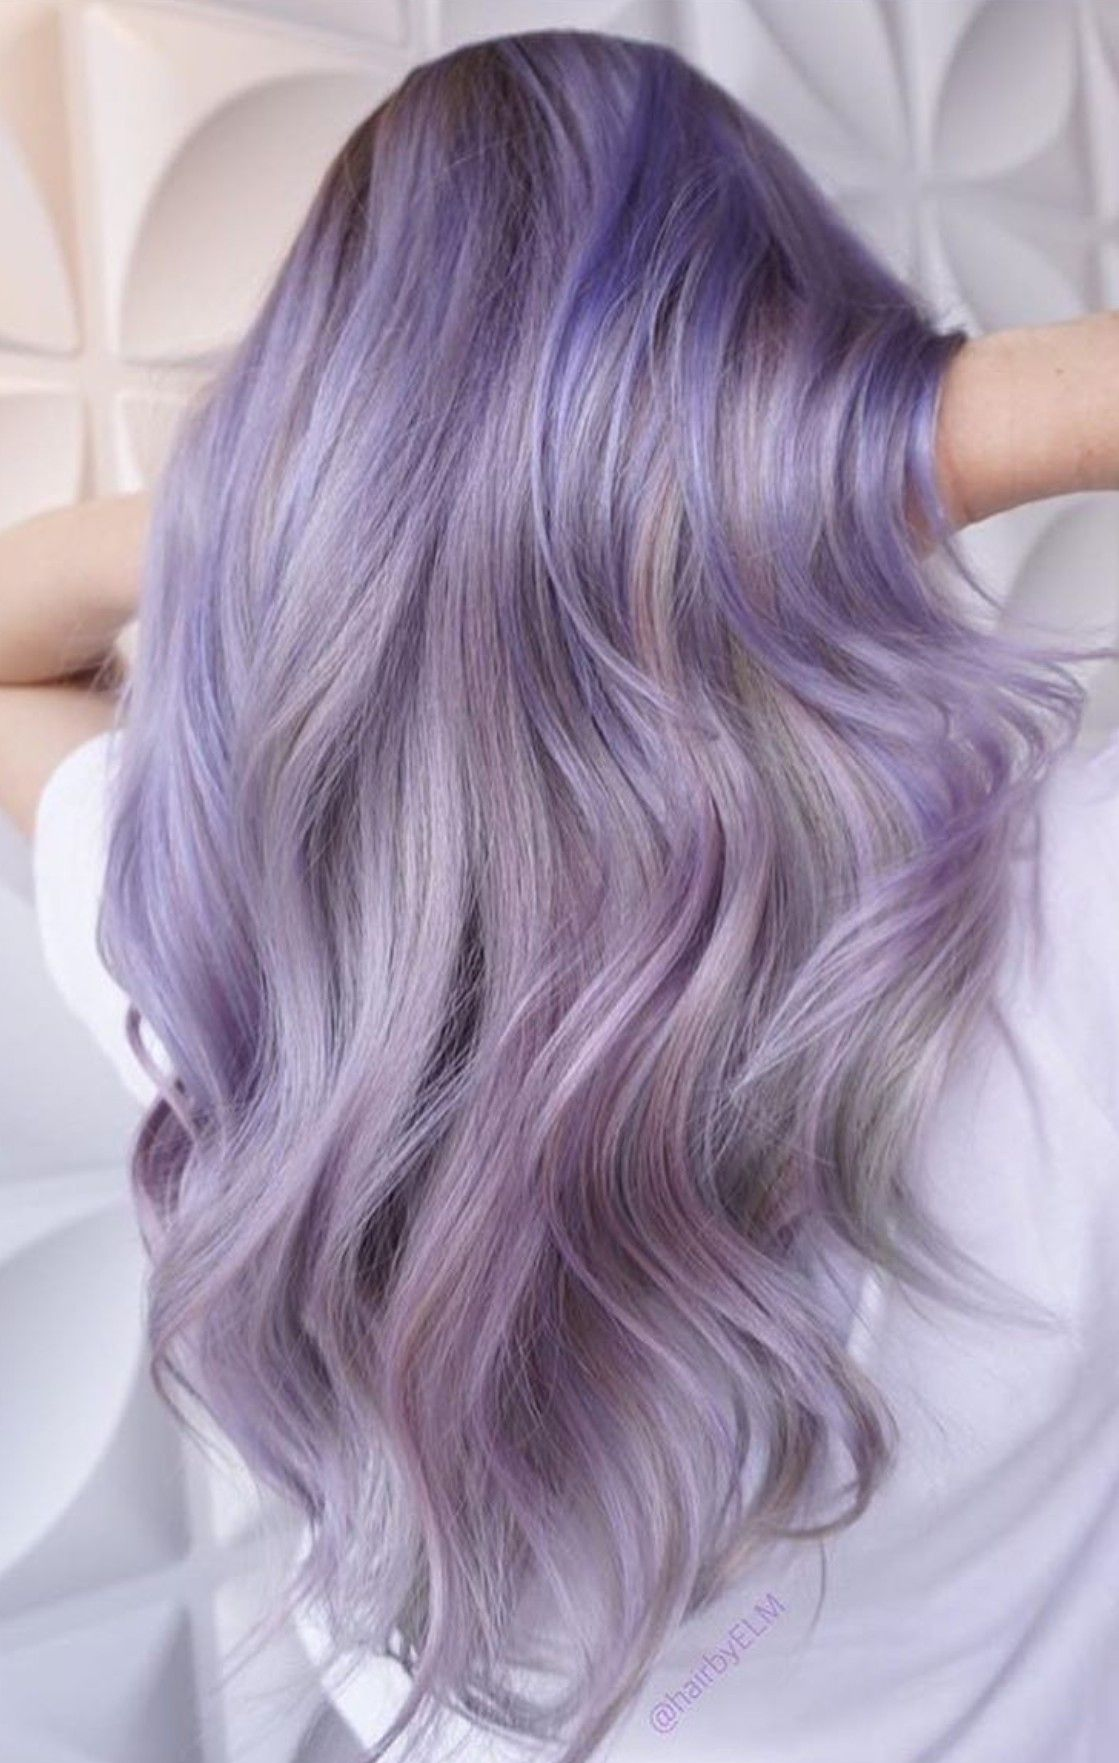 Pin By Christina Watt On Favorites In Hair Lavender Hair Colors